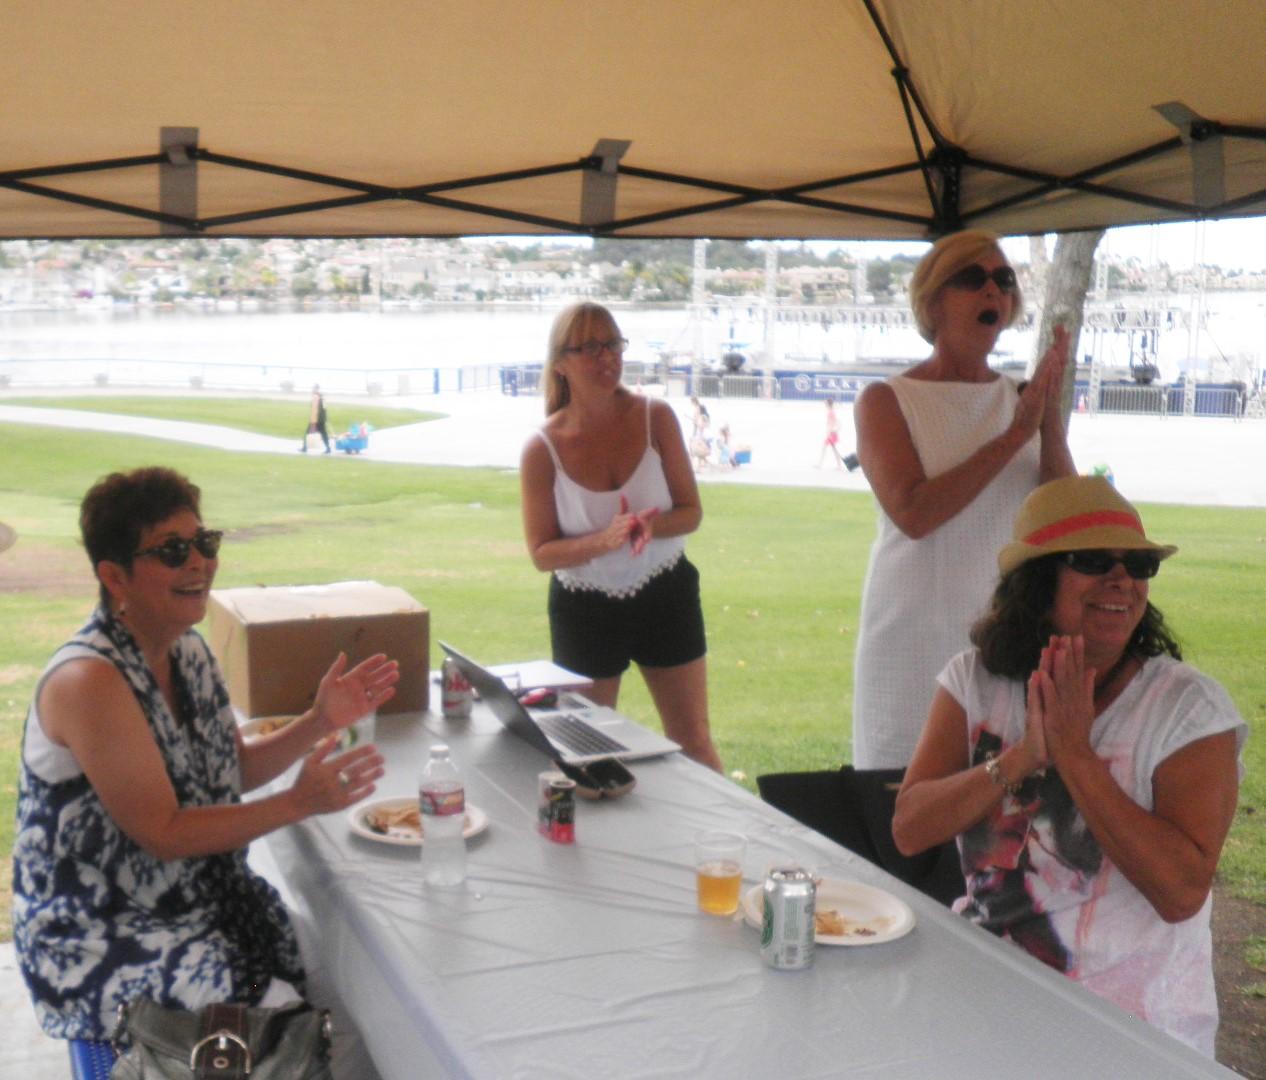 Irene Miller, Gerri Burt, Melissa Rogers and Audrey  Schultz react to a turn of